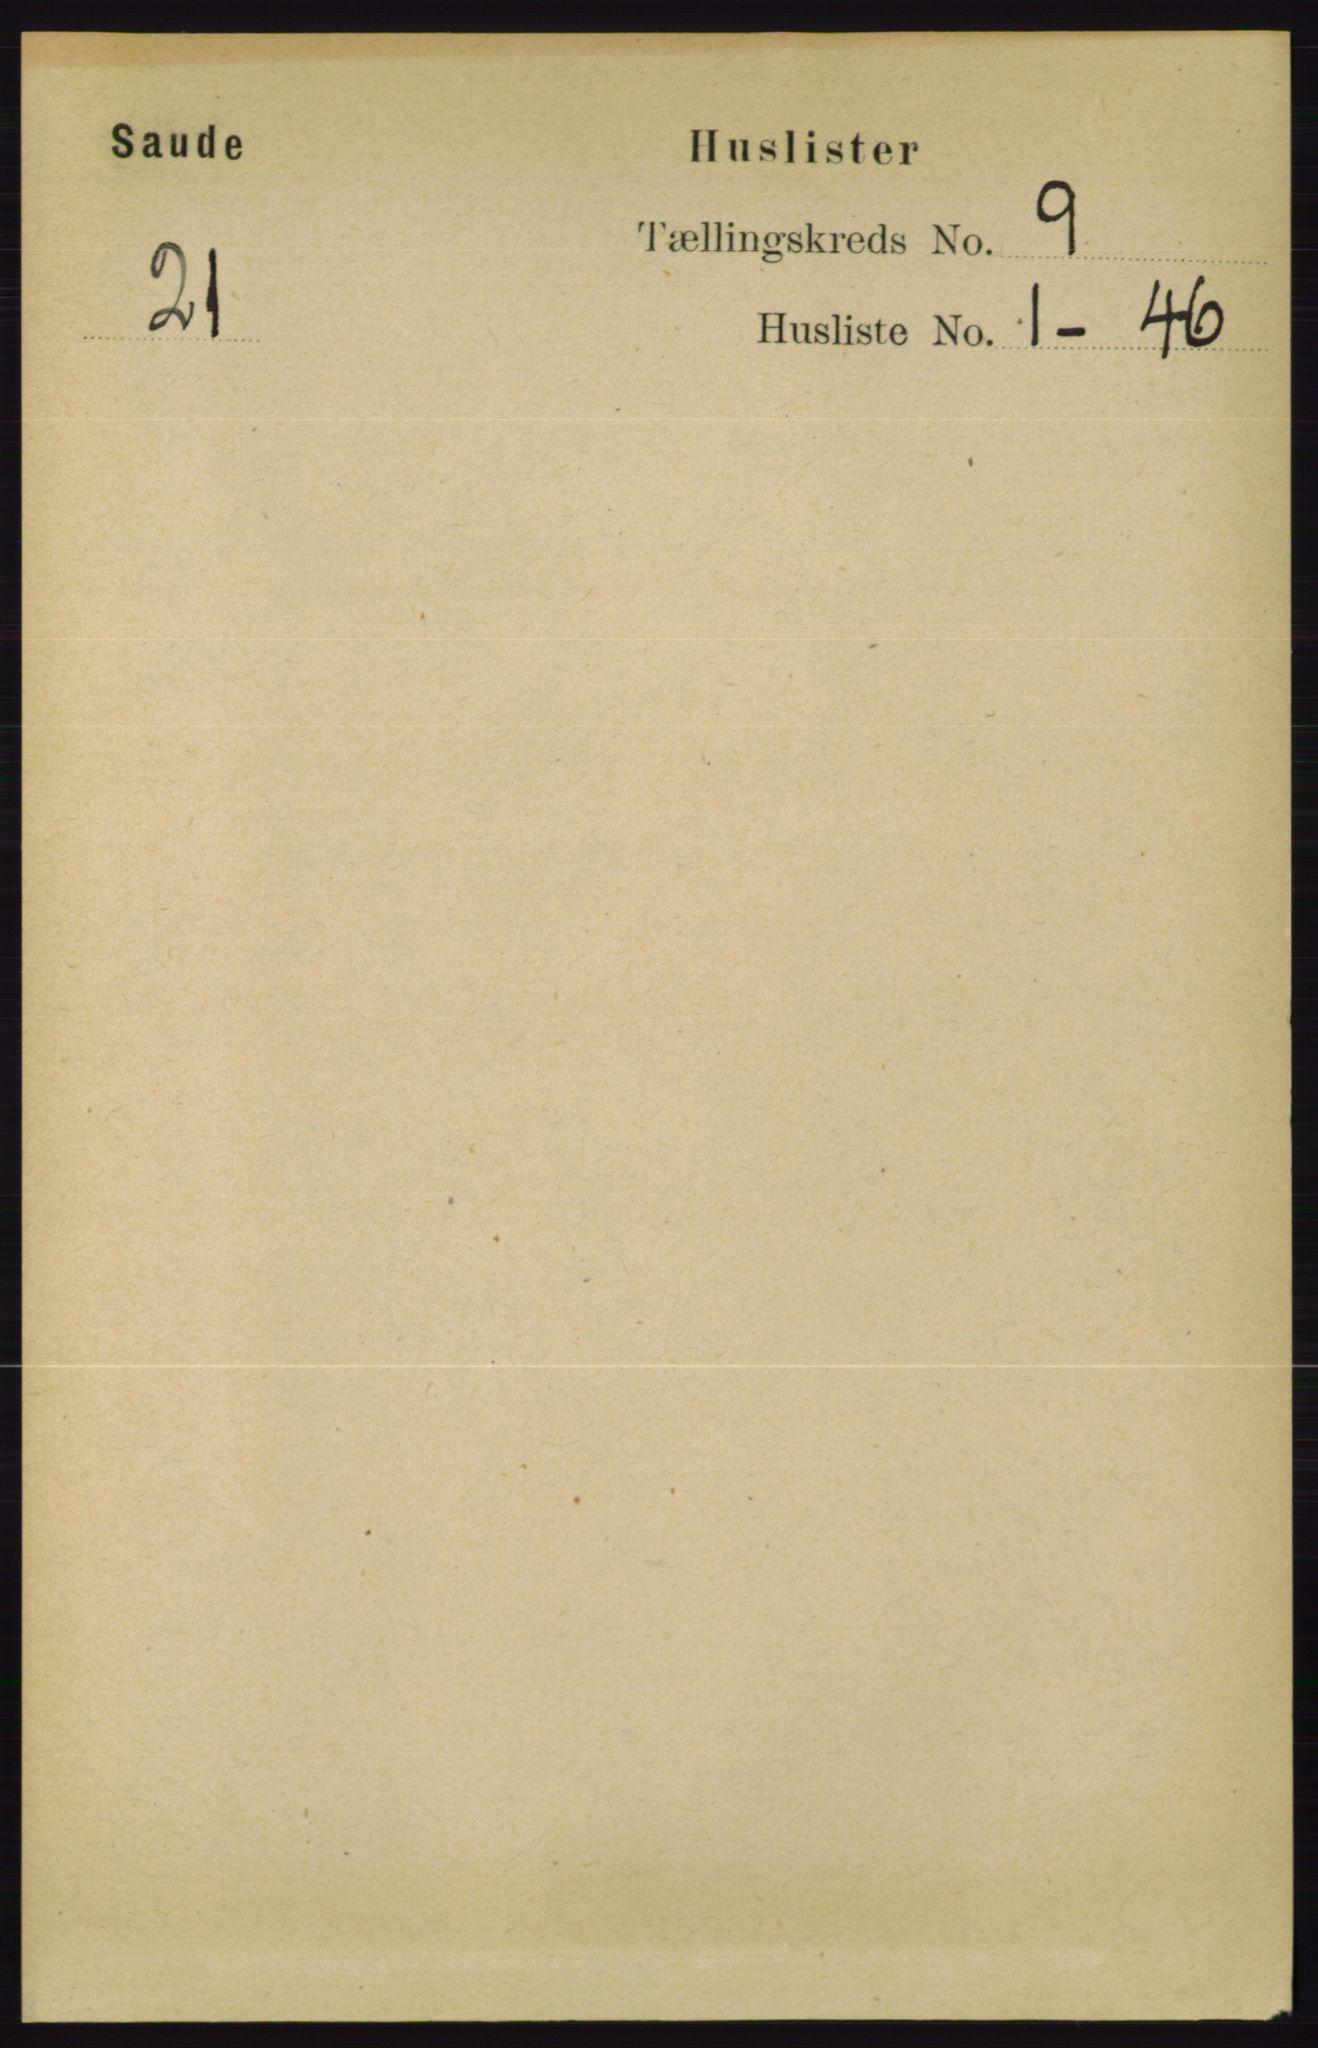 RA, Folketelling 1891 for 0822 Sauherad herred, 1891, s. 2657